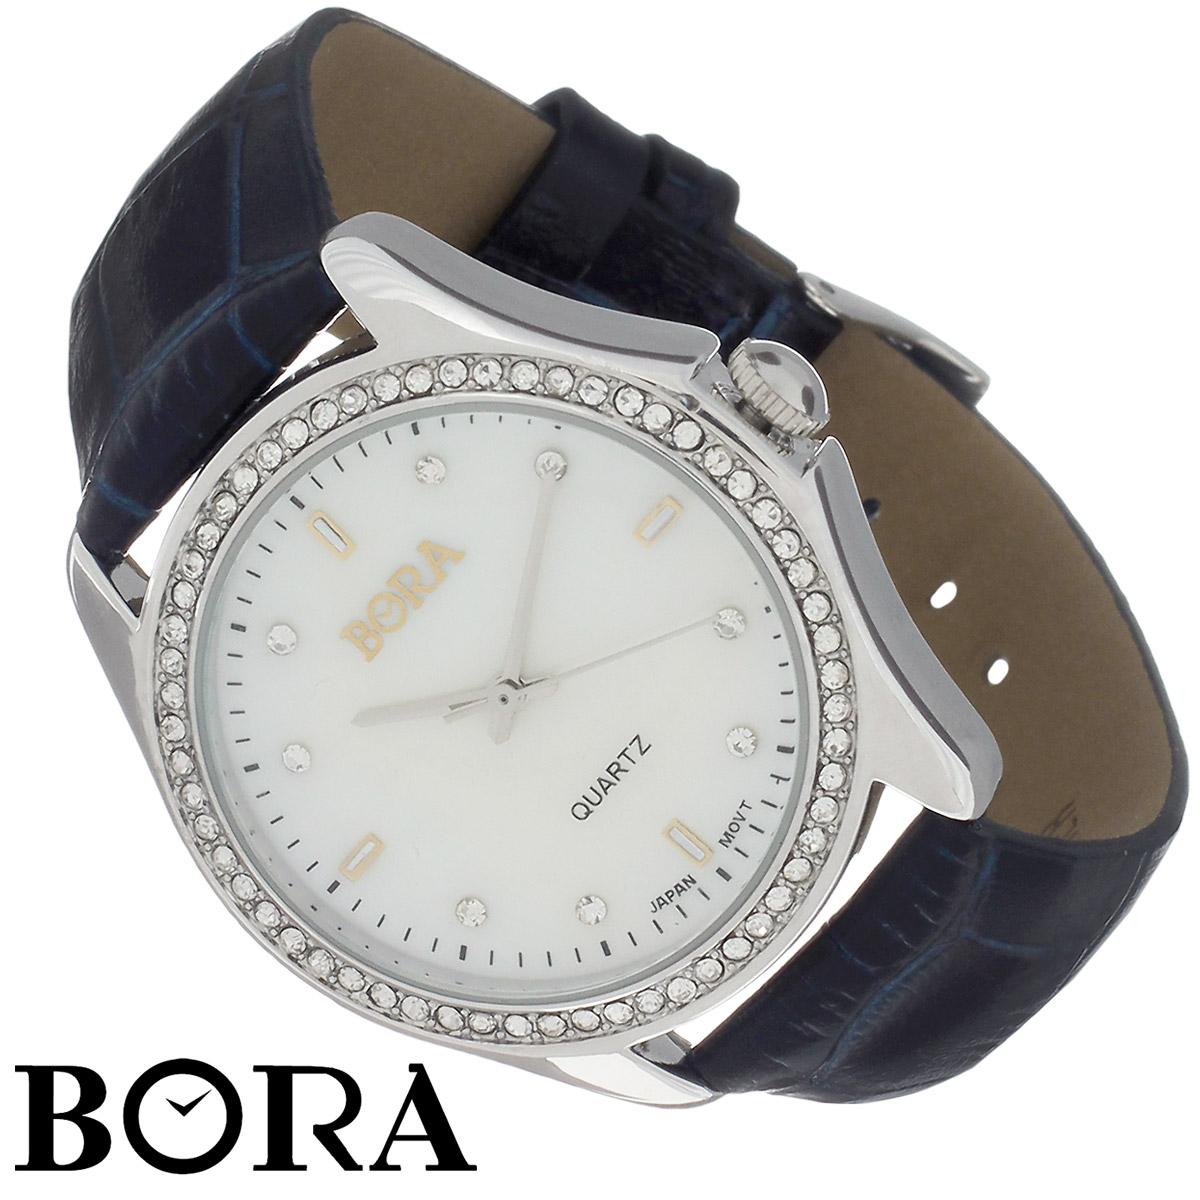 ���� ������� �������� Bora, ����: ����������, ������. T-B-8537-WATCH-SL.D.NAVY - Bora - BoraT-B-8537-WATCH-SL.D.NAVY�������� ������� ���� Bora ����������� �������� ������������� �� ���������� ������ �������� �������� �� ���� �������� ����������. ���� �������� �������� ��������� ����������. ������ ����� �������� �� ����������� ����� � PVD-��������� � �� ������� ���������� �������� ����������� Swarovski. ��������� �� ������������ ���������� ����������� ���������� ������� � ����������� Swarovski. ������� ���������� �� ����������� ���� � ���������. ���� Bora �������� ������ ������ ����� ������������ � ������������. ��������������: ������� ����������: 3 ��. ������ �������: 1,6 ��. ����� ������� (� ������ �������): 22,5 ��. ������ ������� �����: 3,6 �� � 4,1 �� � 0,8 ��.